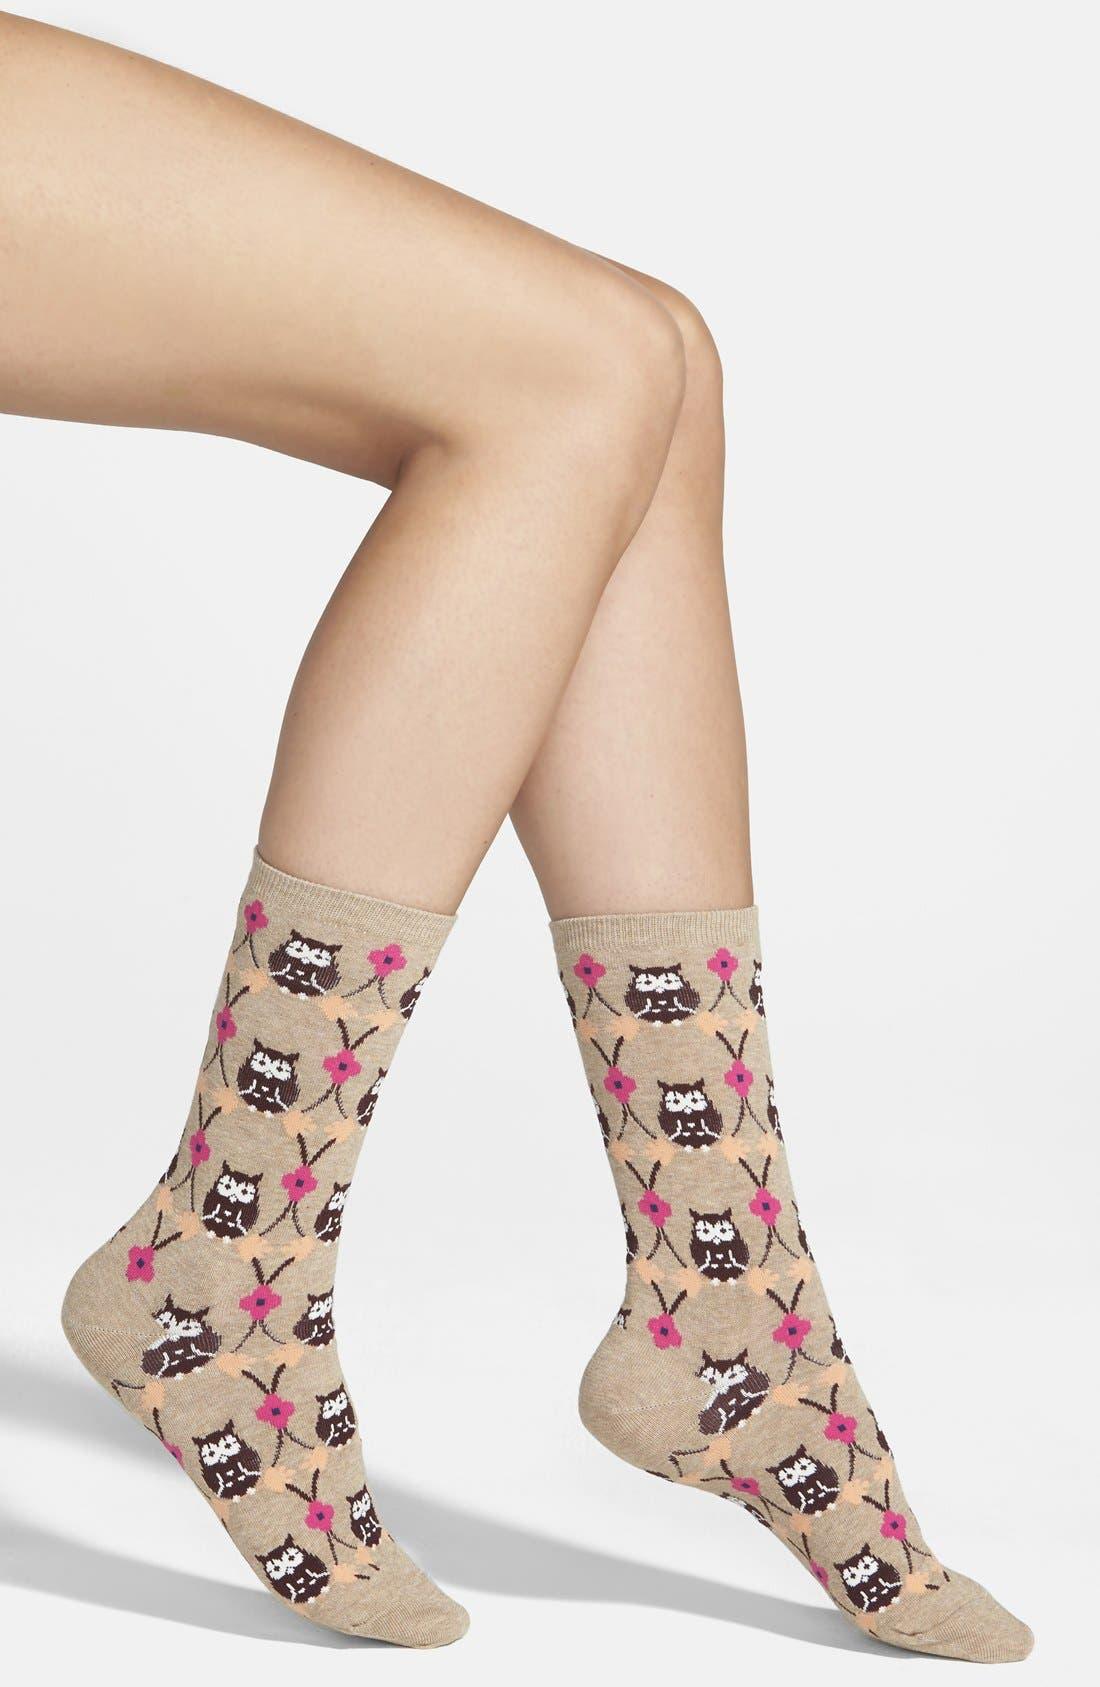 Main Image - Hot Sox 'Owl' Crew Socks (3 for $15)